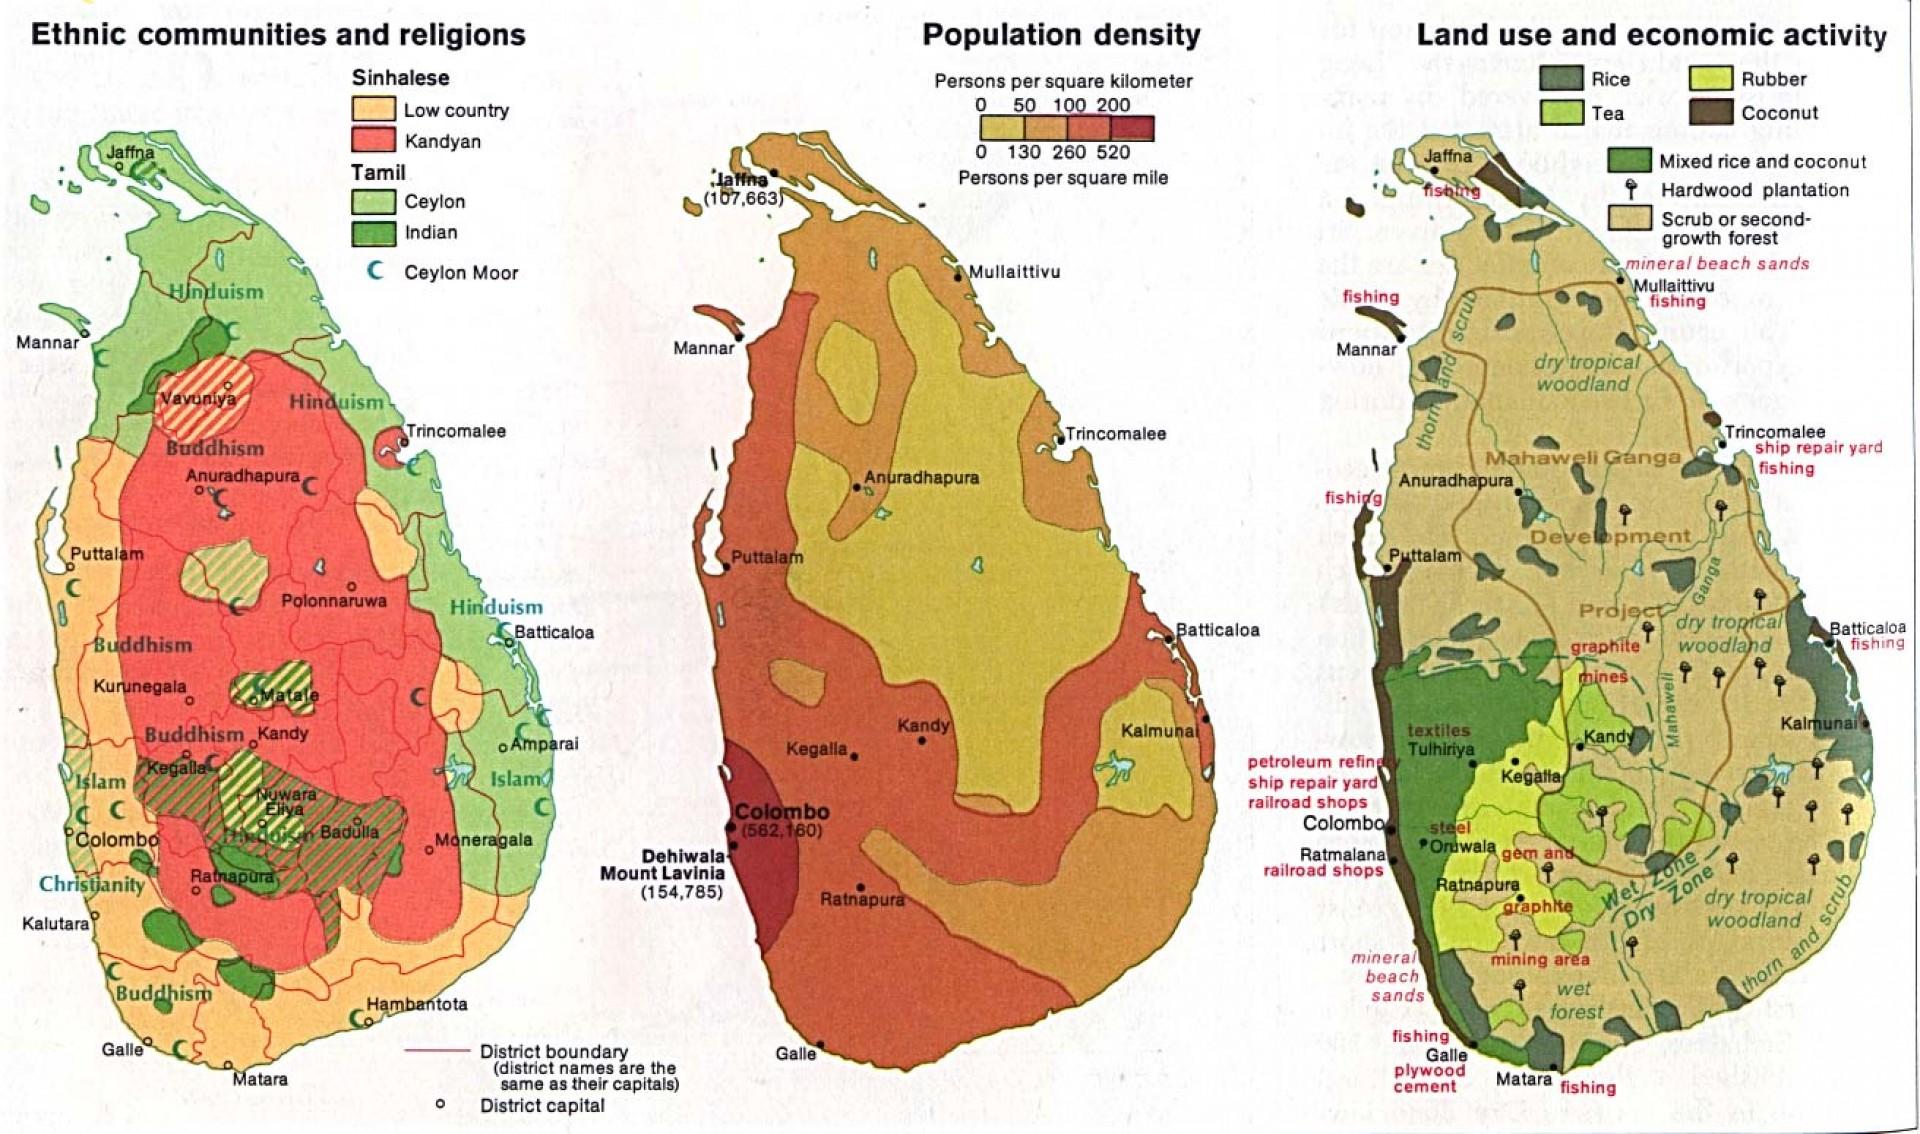 015 Natural Resources In Sri Lanka Essay Charts 76 Fantastic 1920